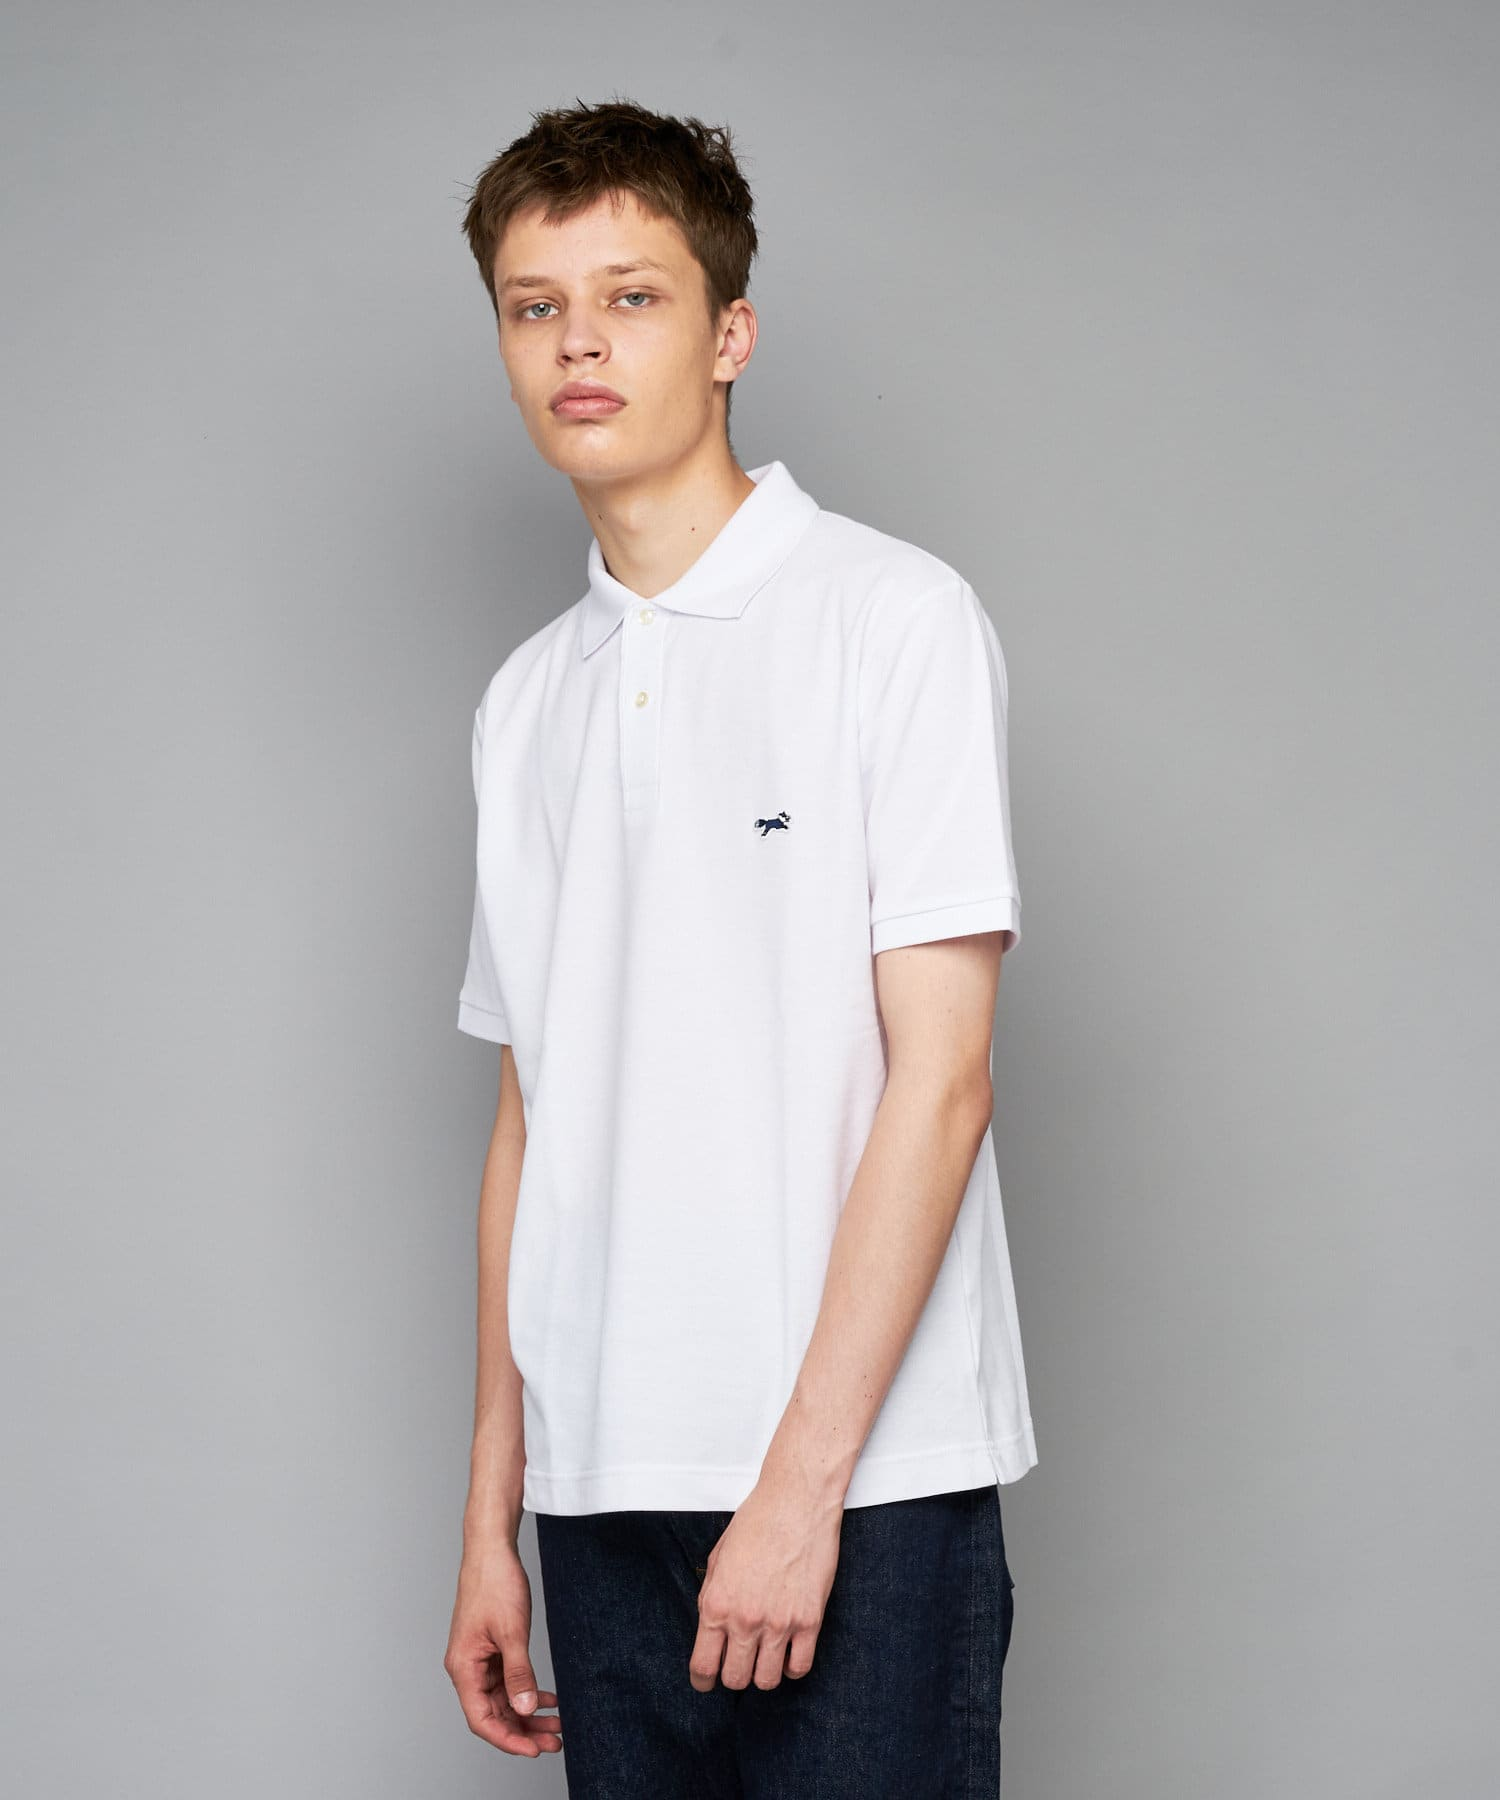 CIAOPANIC(チャオパニック) メンズ 【PENNEYS/ぺニーズ】別注フォックスロゴ刺繍ポロシャツ ホワイト